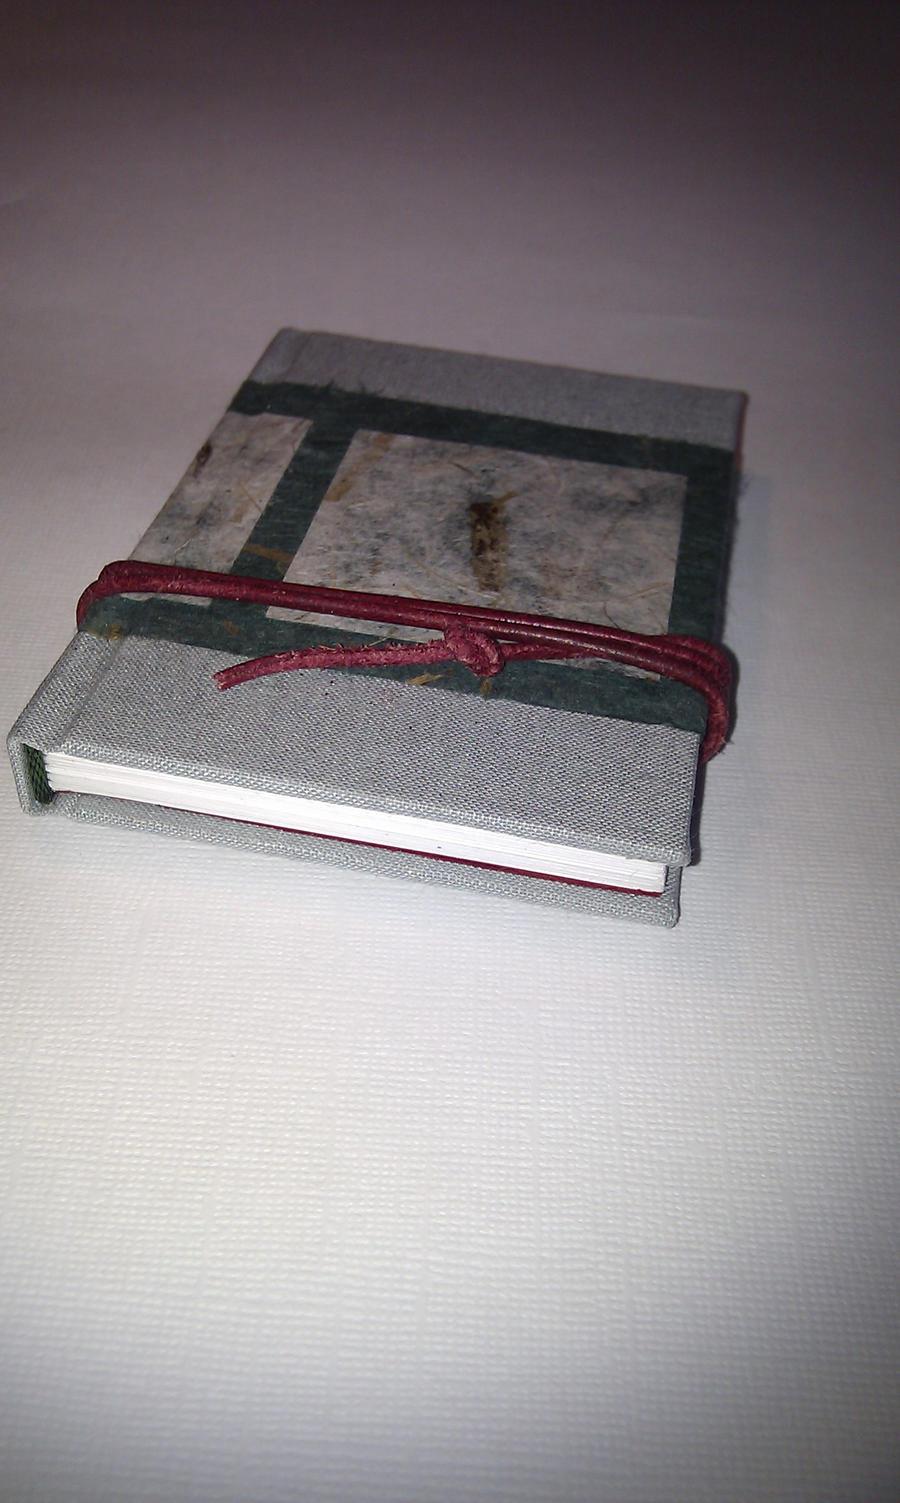 Book by ZineIsGoingCrazy